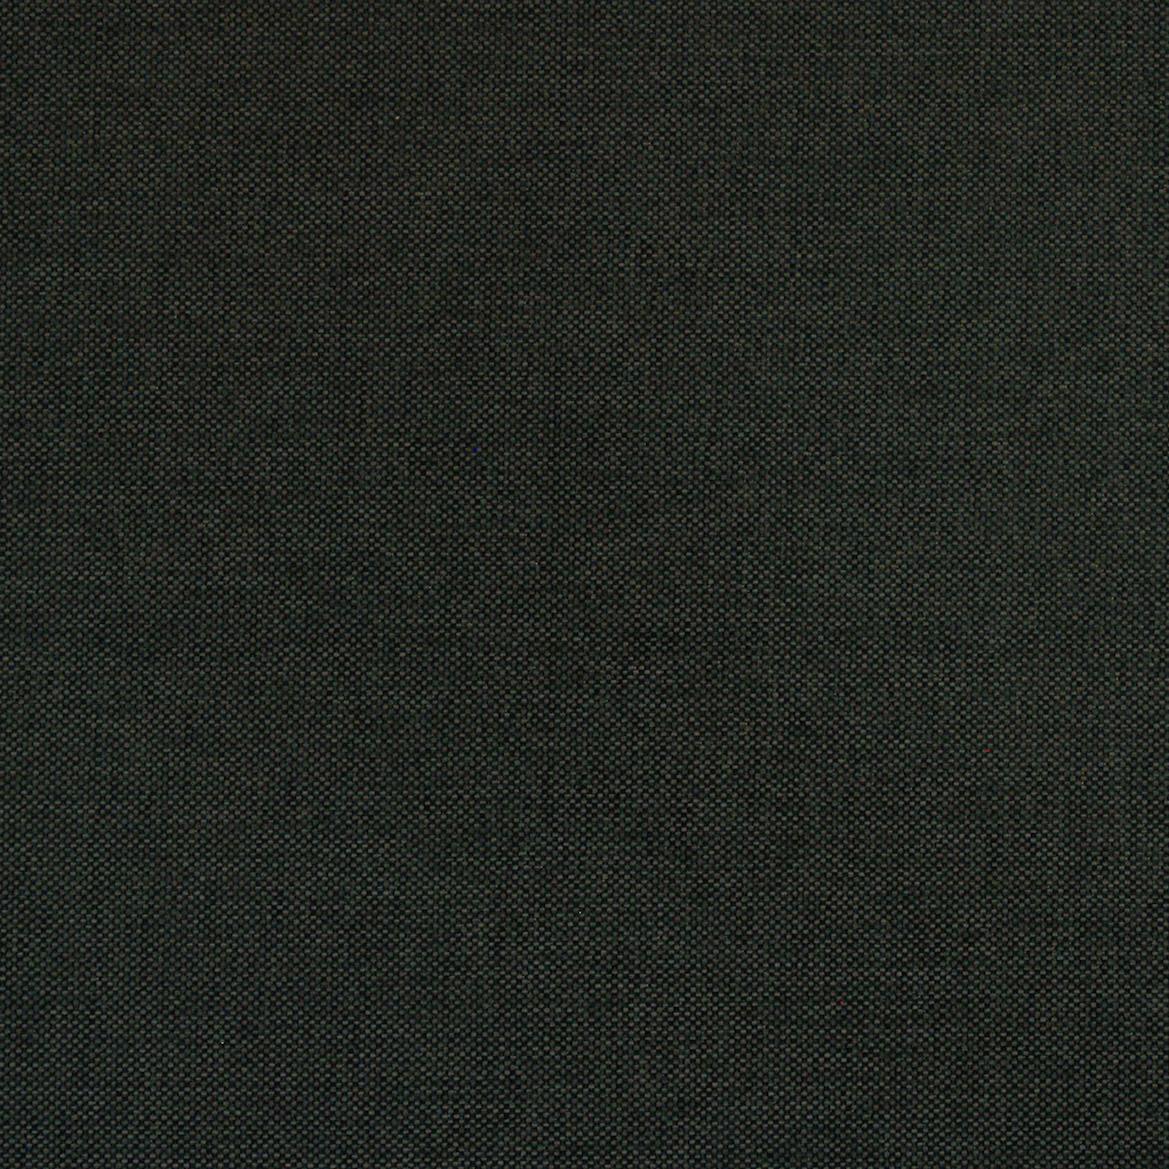 4 Drom black